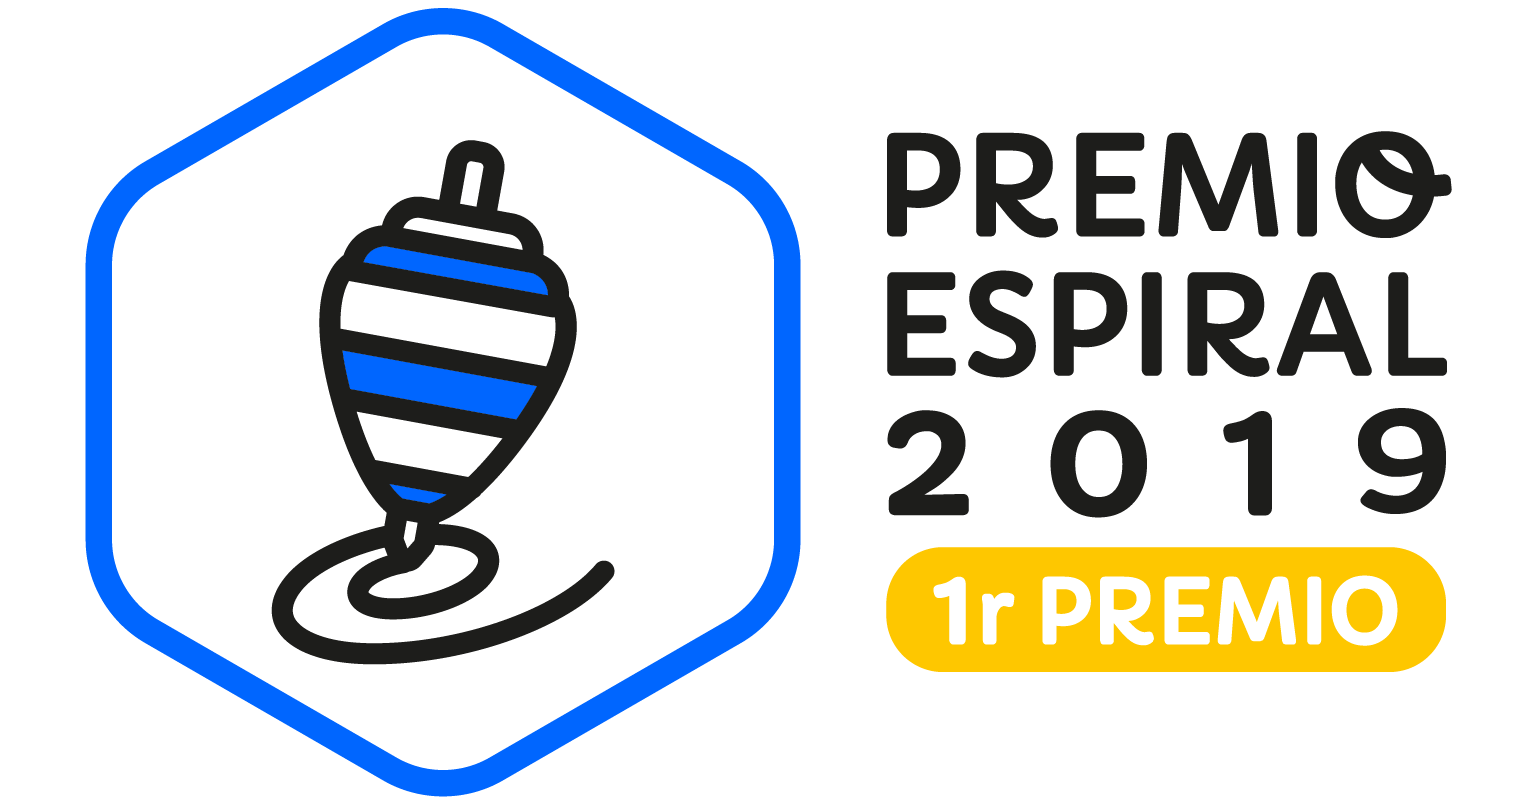 #PremioEspiral